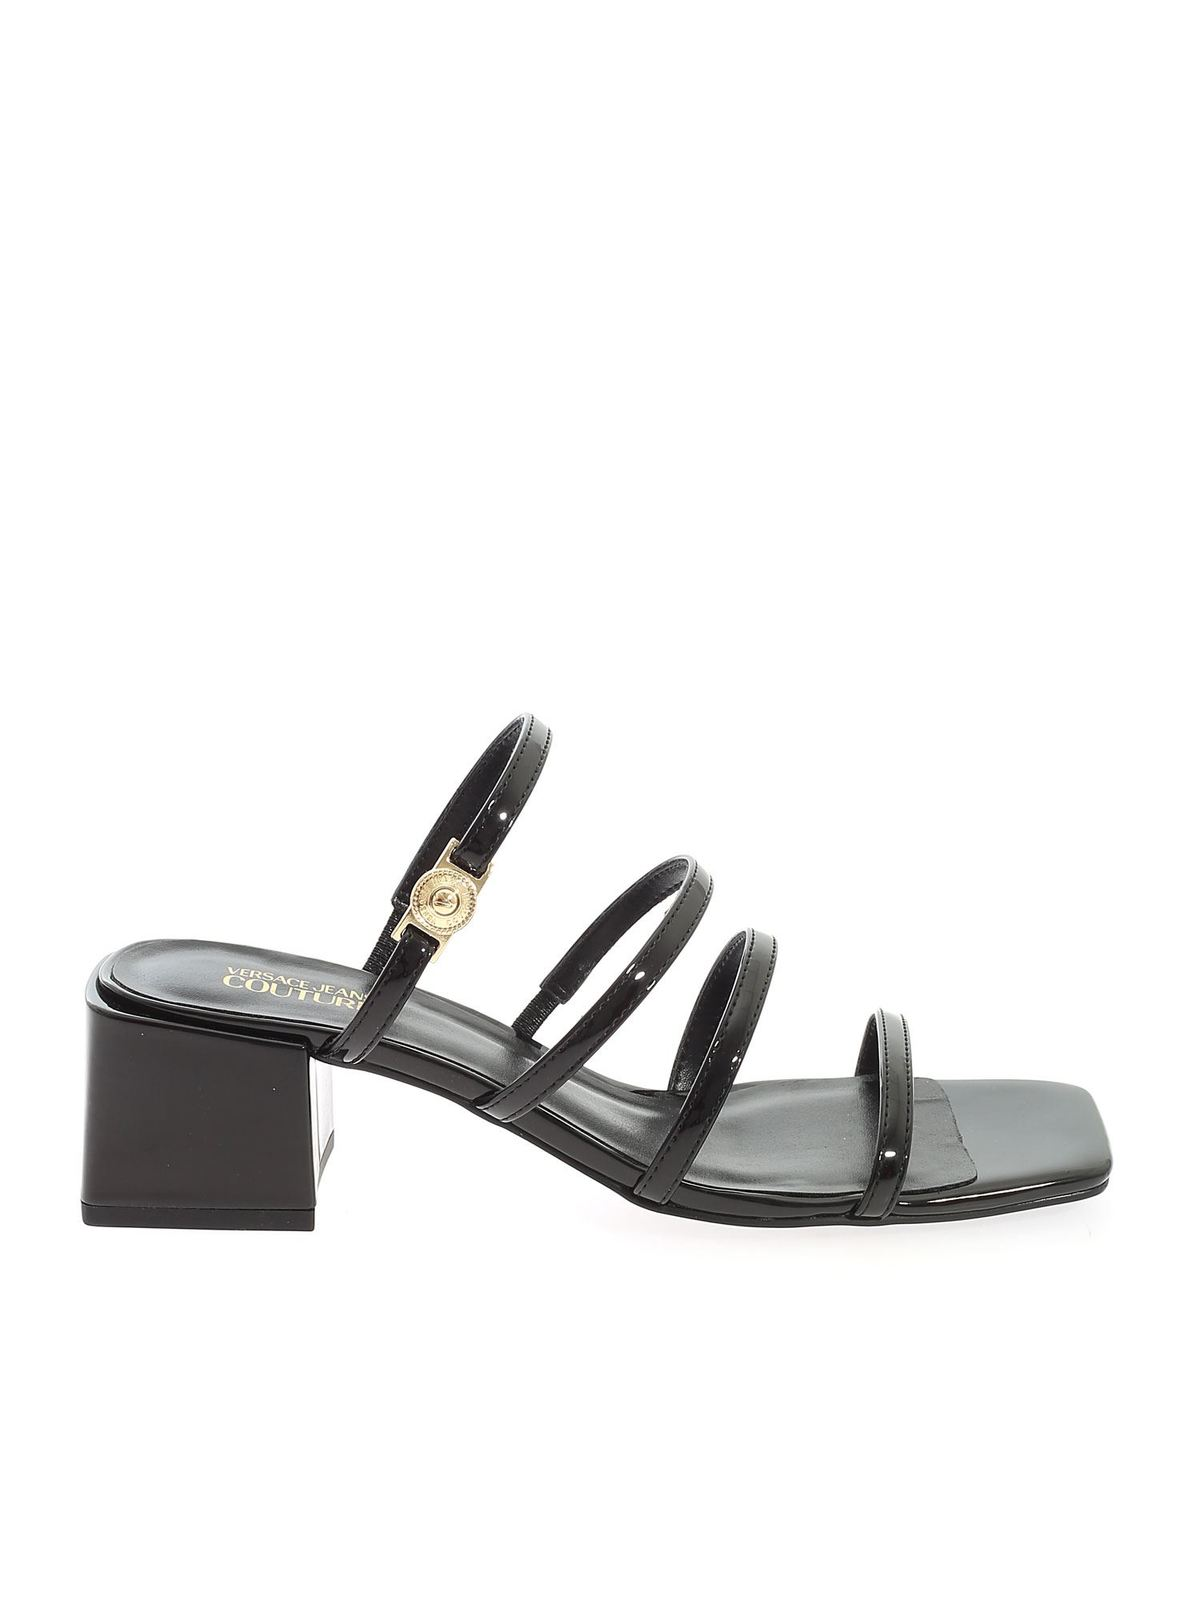 Versace Jeans Couture Mid heels STRIP SANDALS IN BLACK